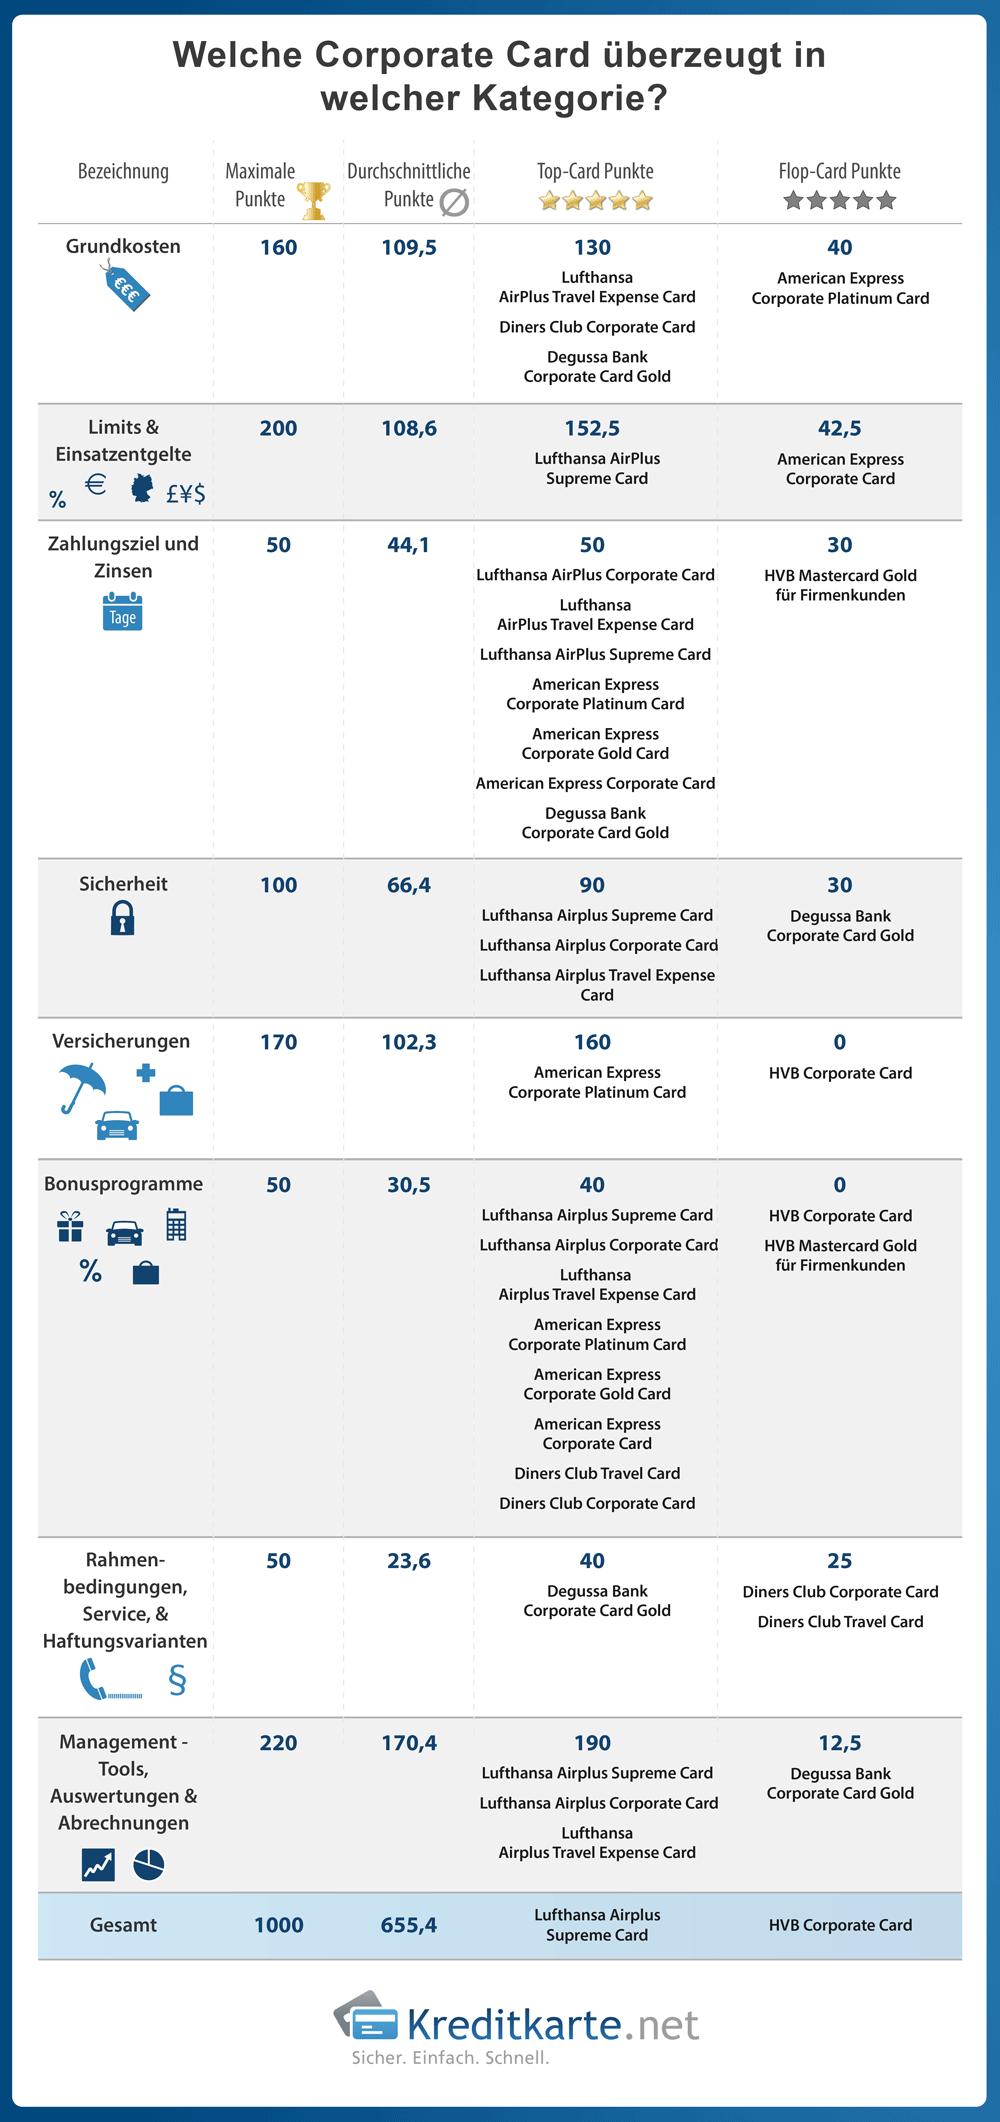 infografik-corporate-card-test-top-flop-punkte